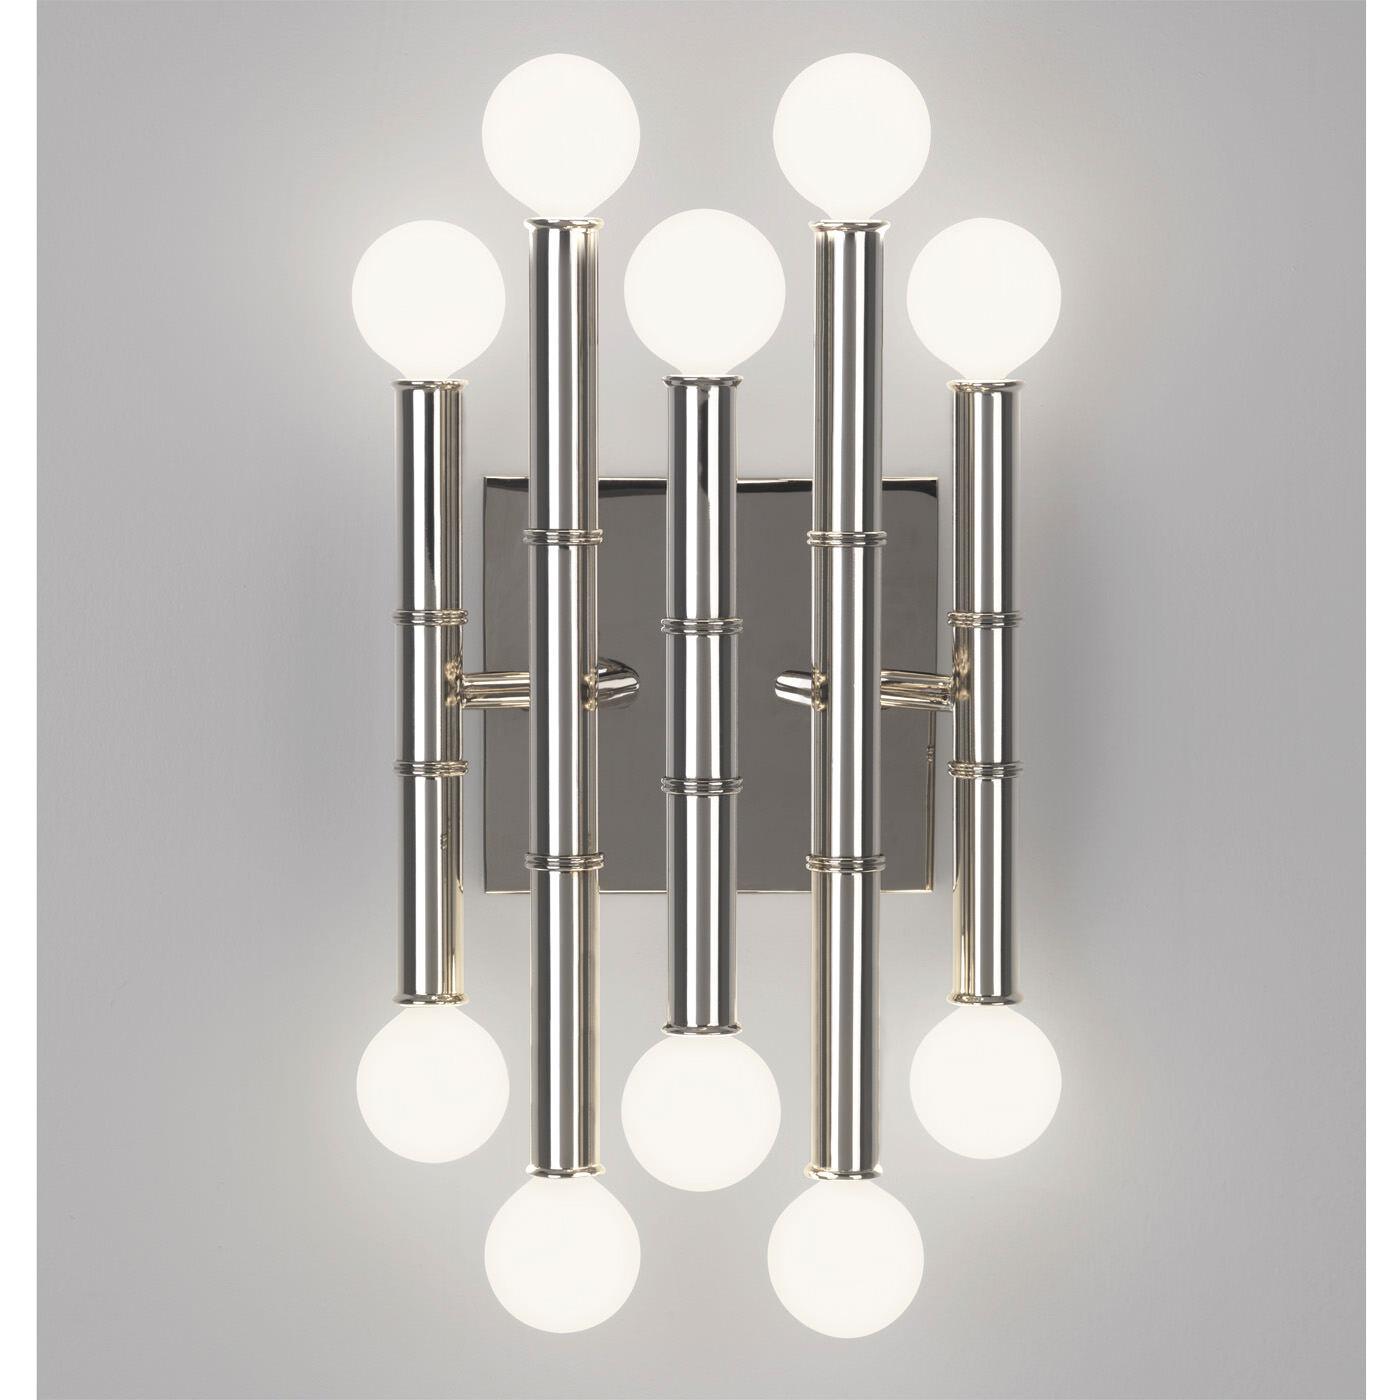 wall lamps u0026amp sconces meurice fivearm sconce - Robert Abbey Lighting